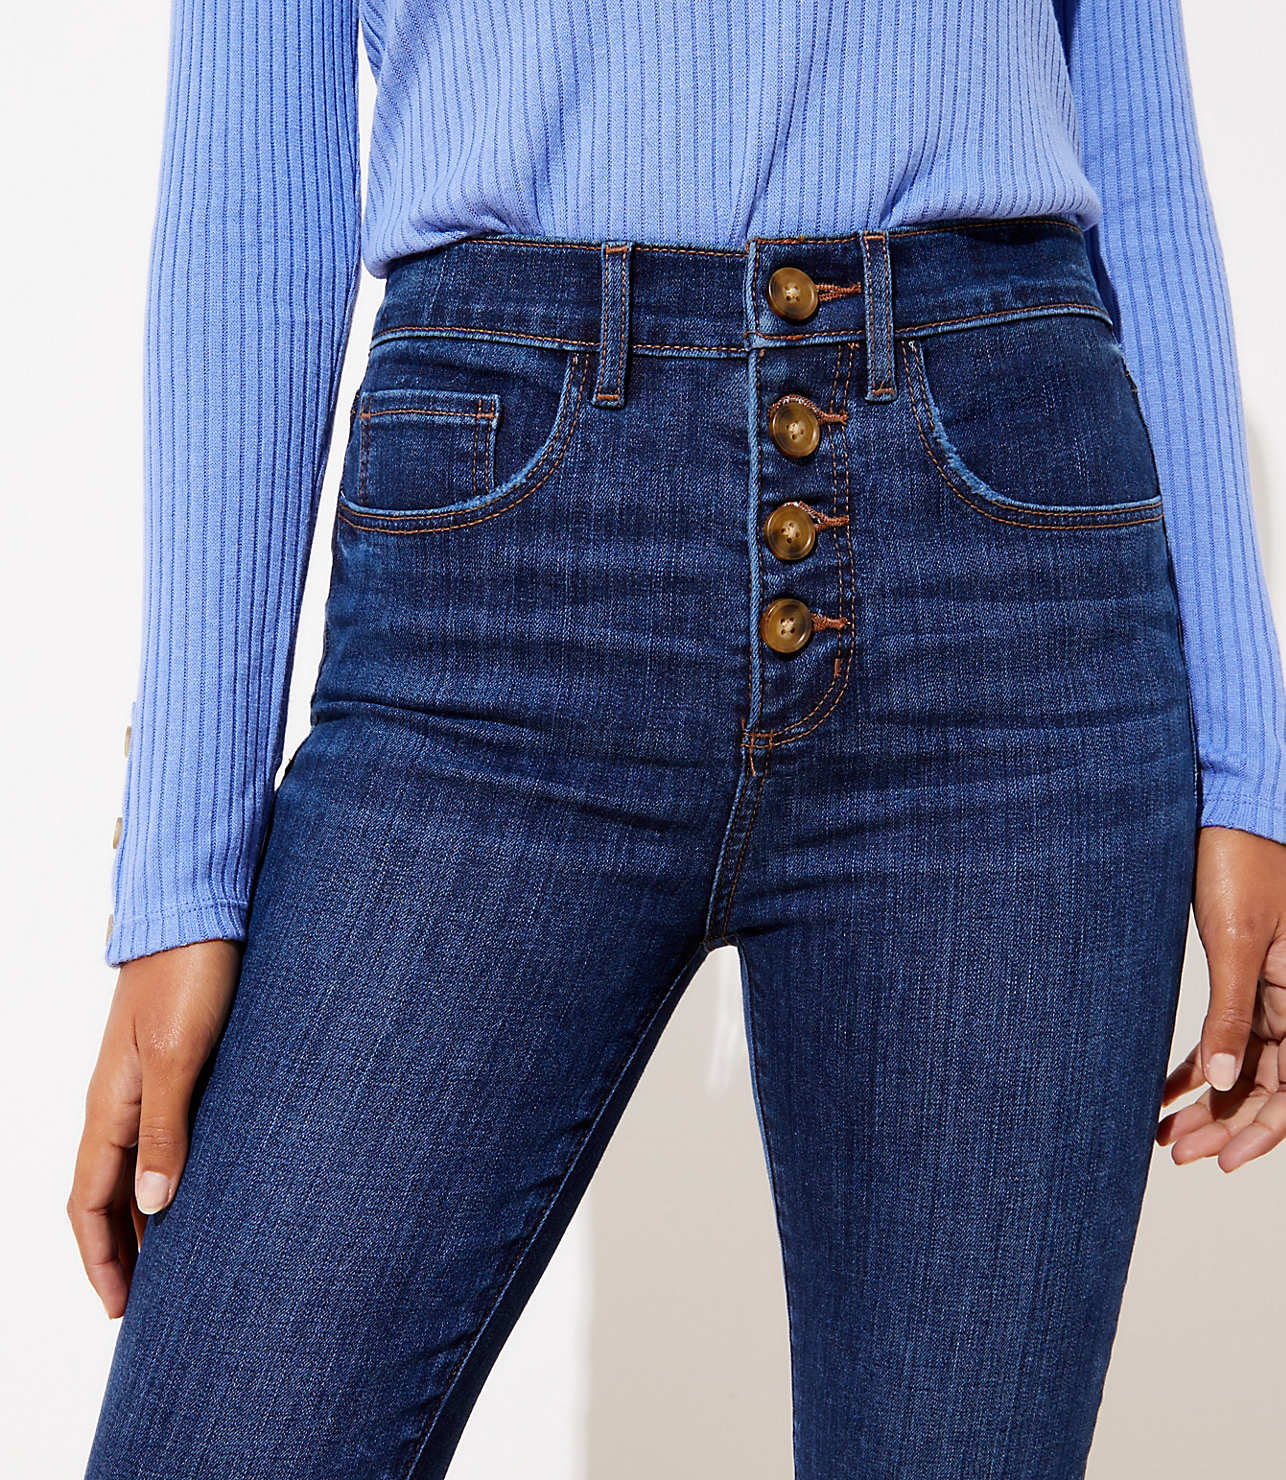 curvy high rise slim pocket skinny jeans in staple dark indigo wash loft jeans levi's jeans #8